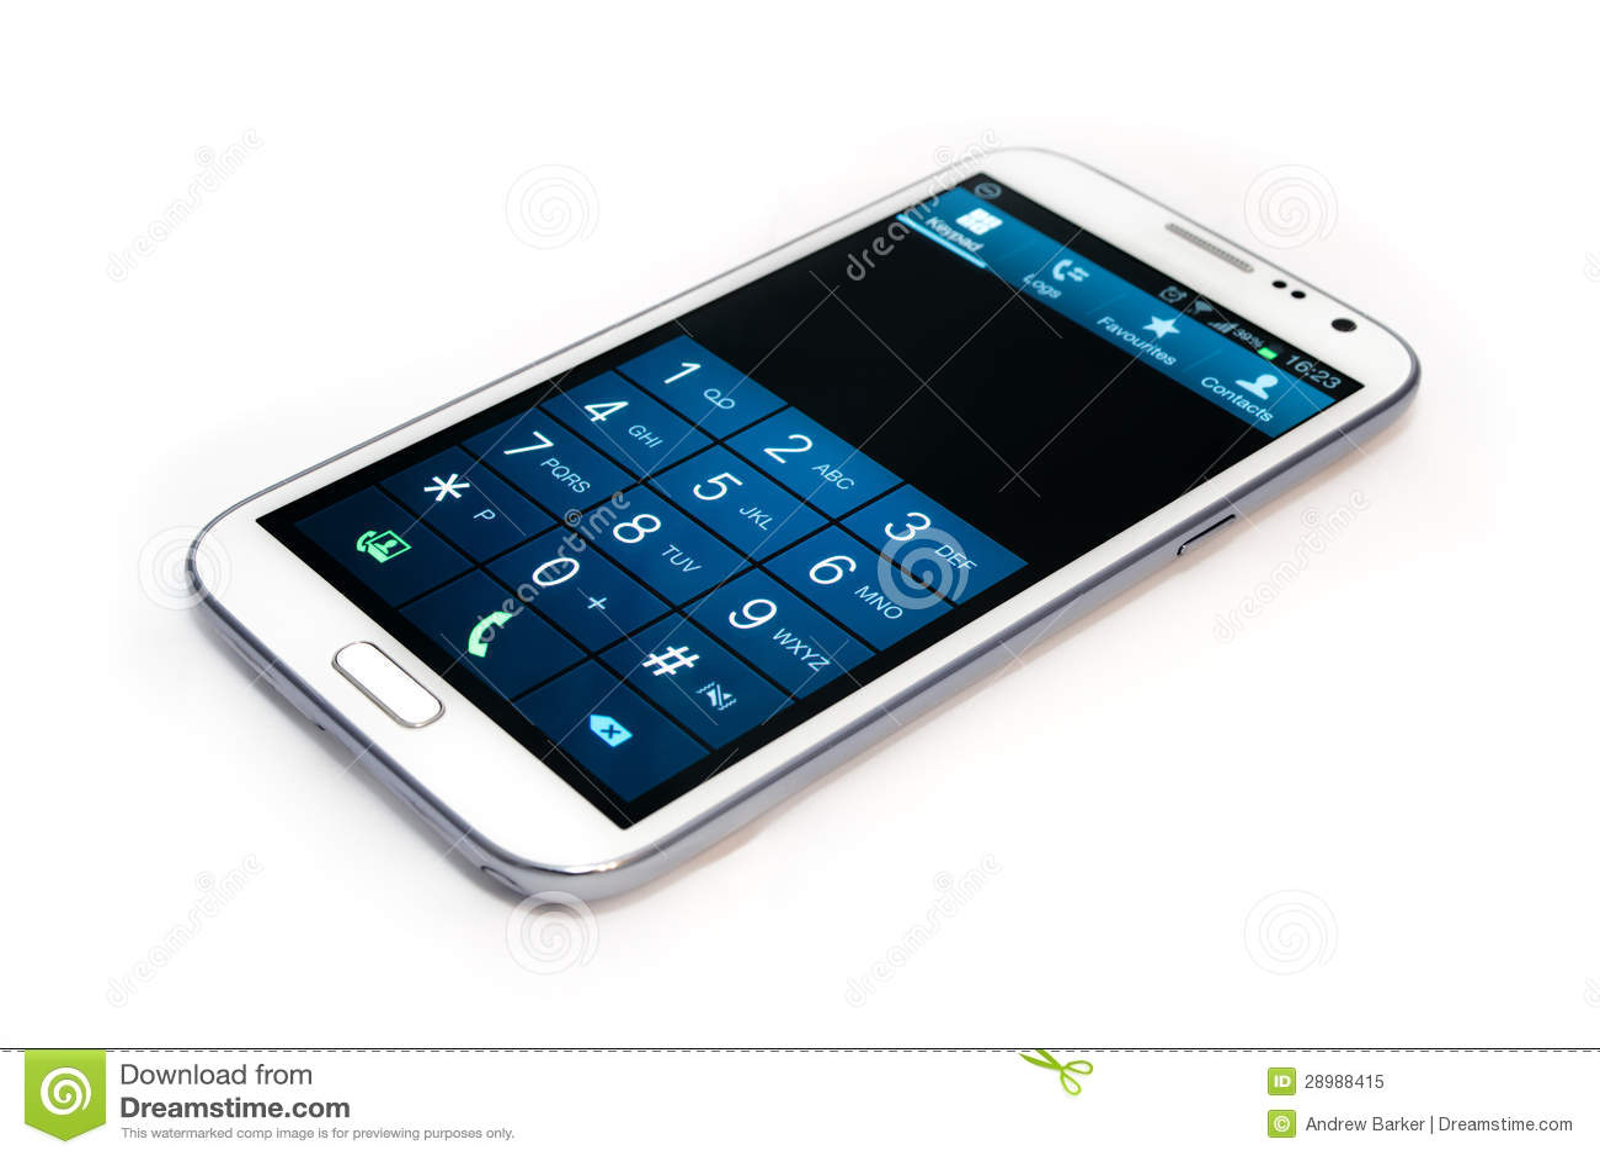 mobile telephone stock image image of business cellphone 28988415. Black Bedroom Furniture Sets. Home Design Ideas